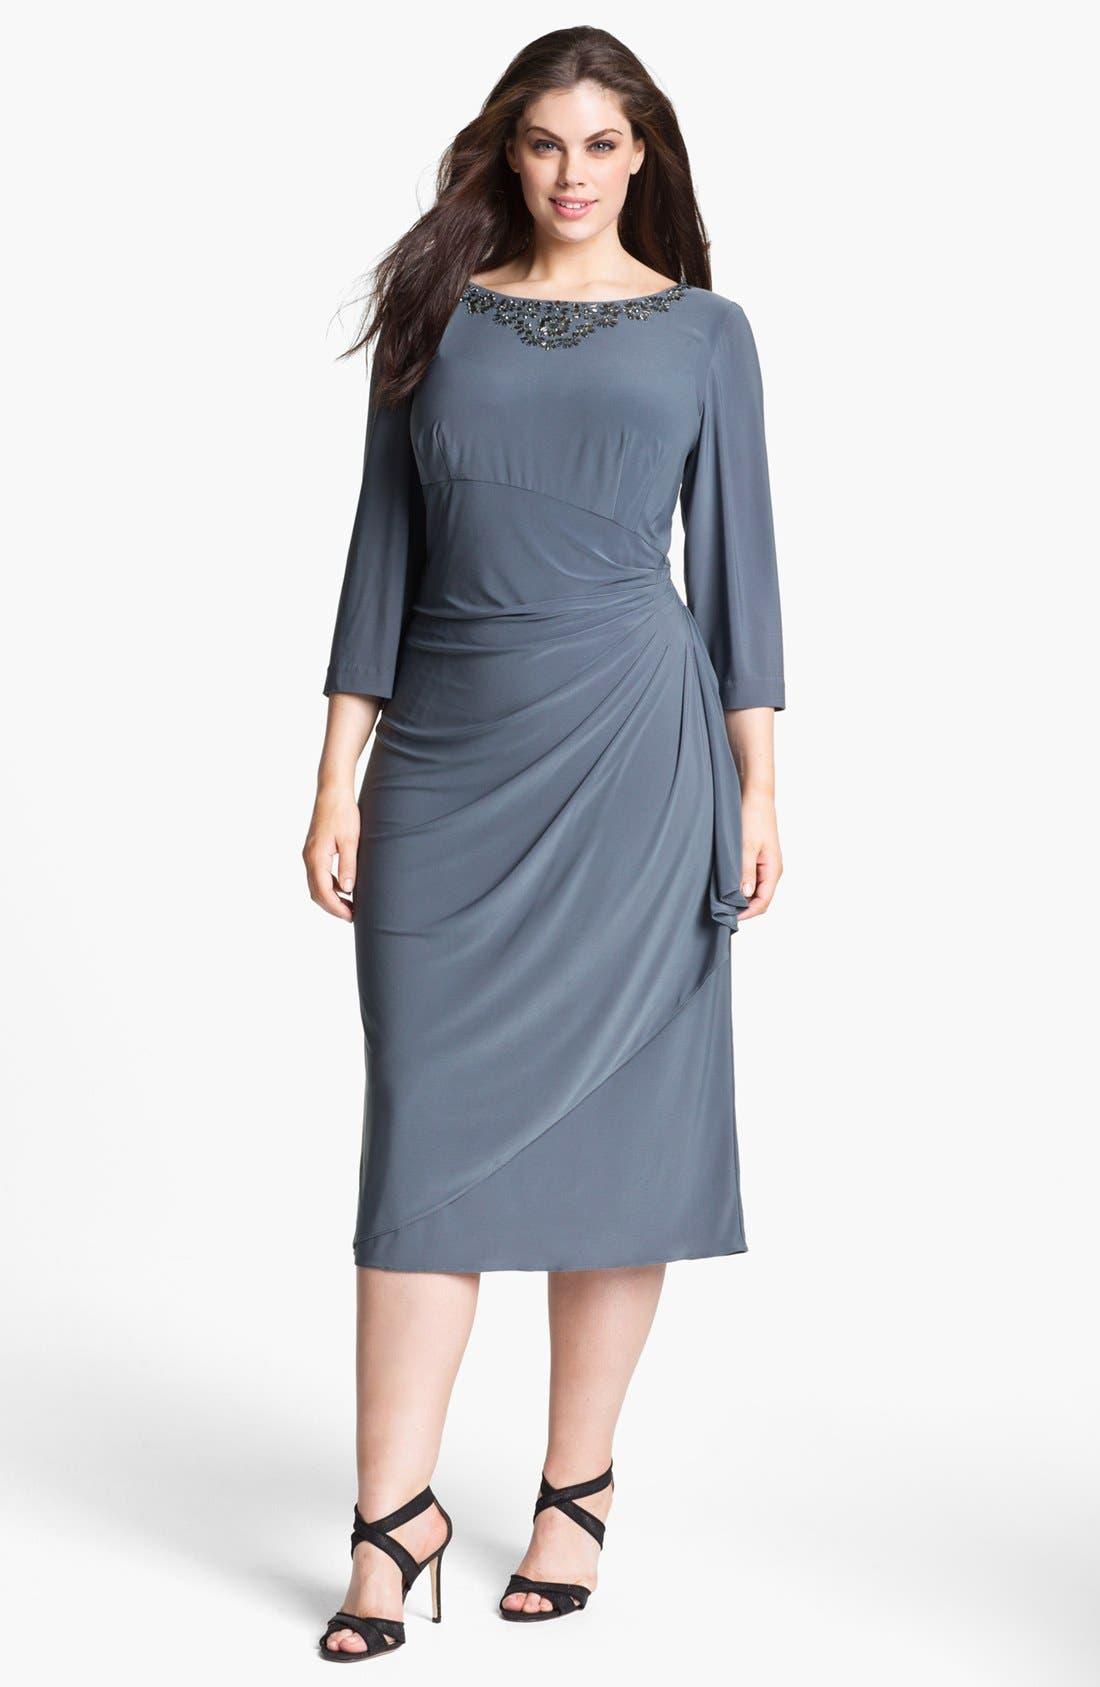 Alternate Image 1 Selected - Alex Evenings Embellished Faux Wrap Dress (Plus Size)